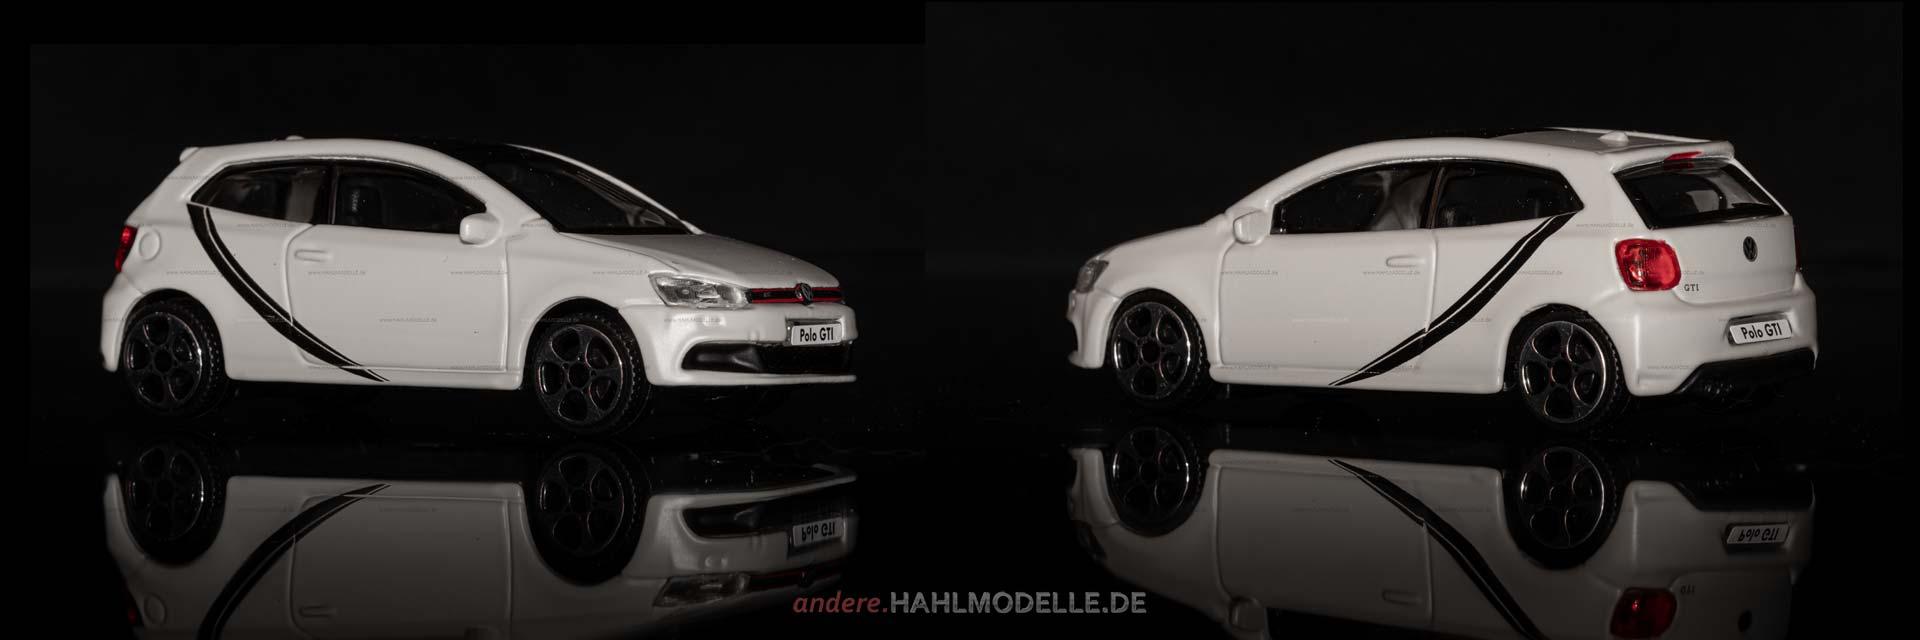 Volkswagen Polo V GTI (Typ 6R) | Limousine | Bburago | 1:43 | www.andere.hahlmodelle.de